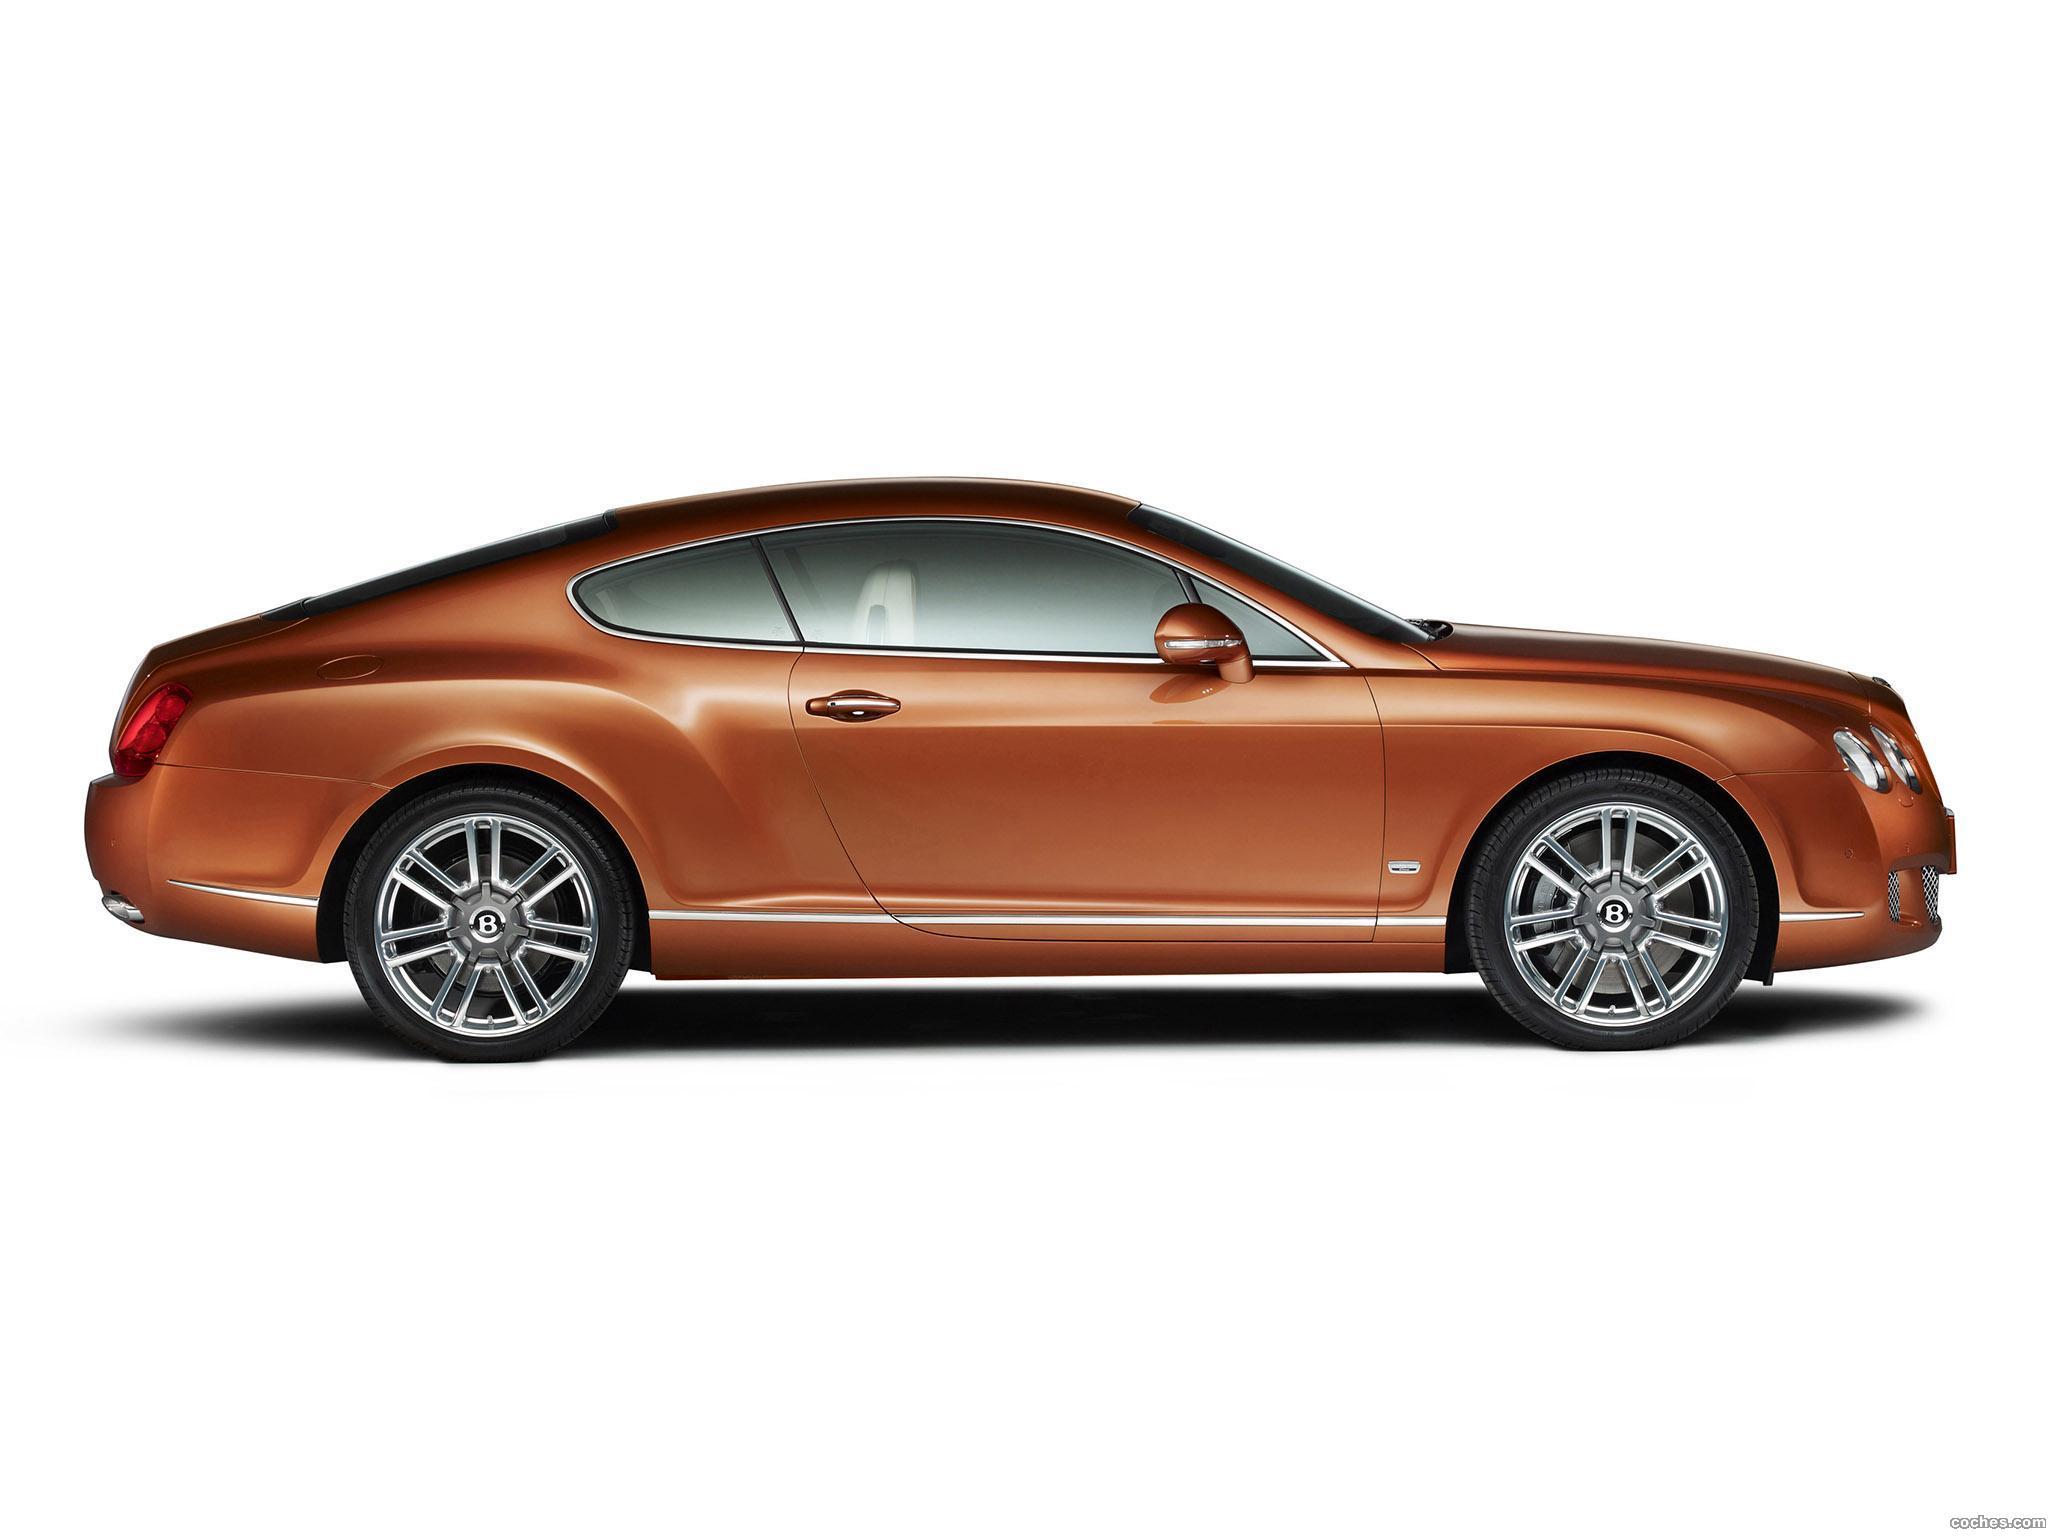 Foto 1 de Bentley esign Series China 2010